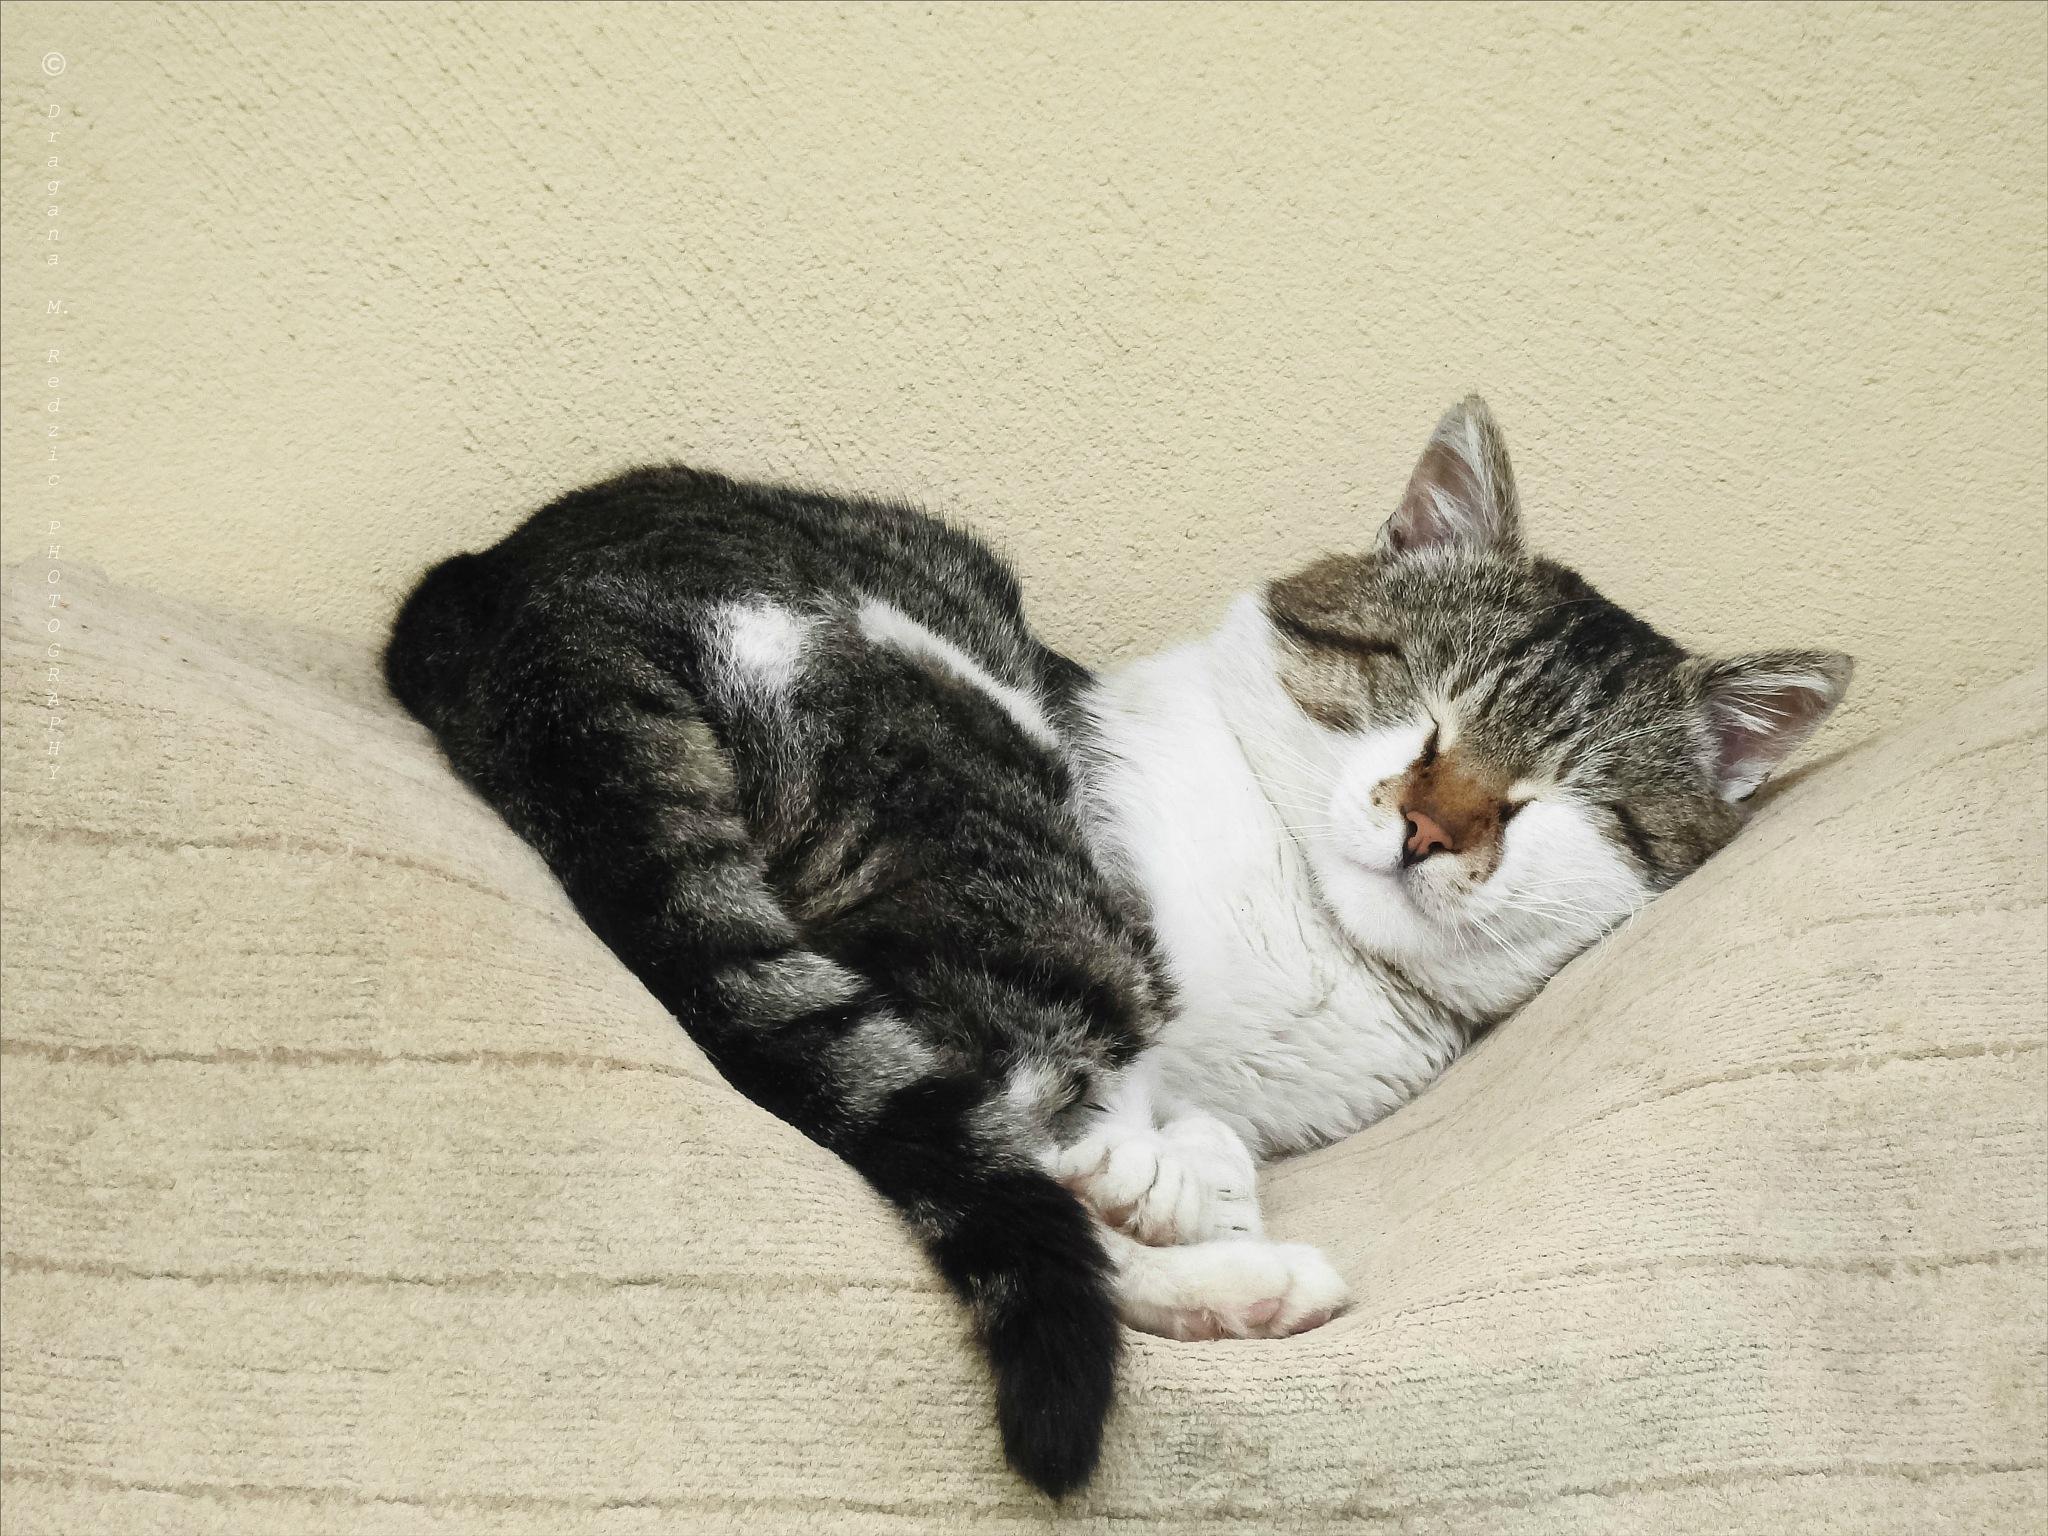 01 Tom Cat - Sweet dreams by Драгана М. Реџић